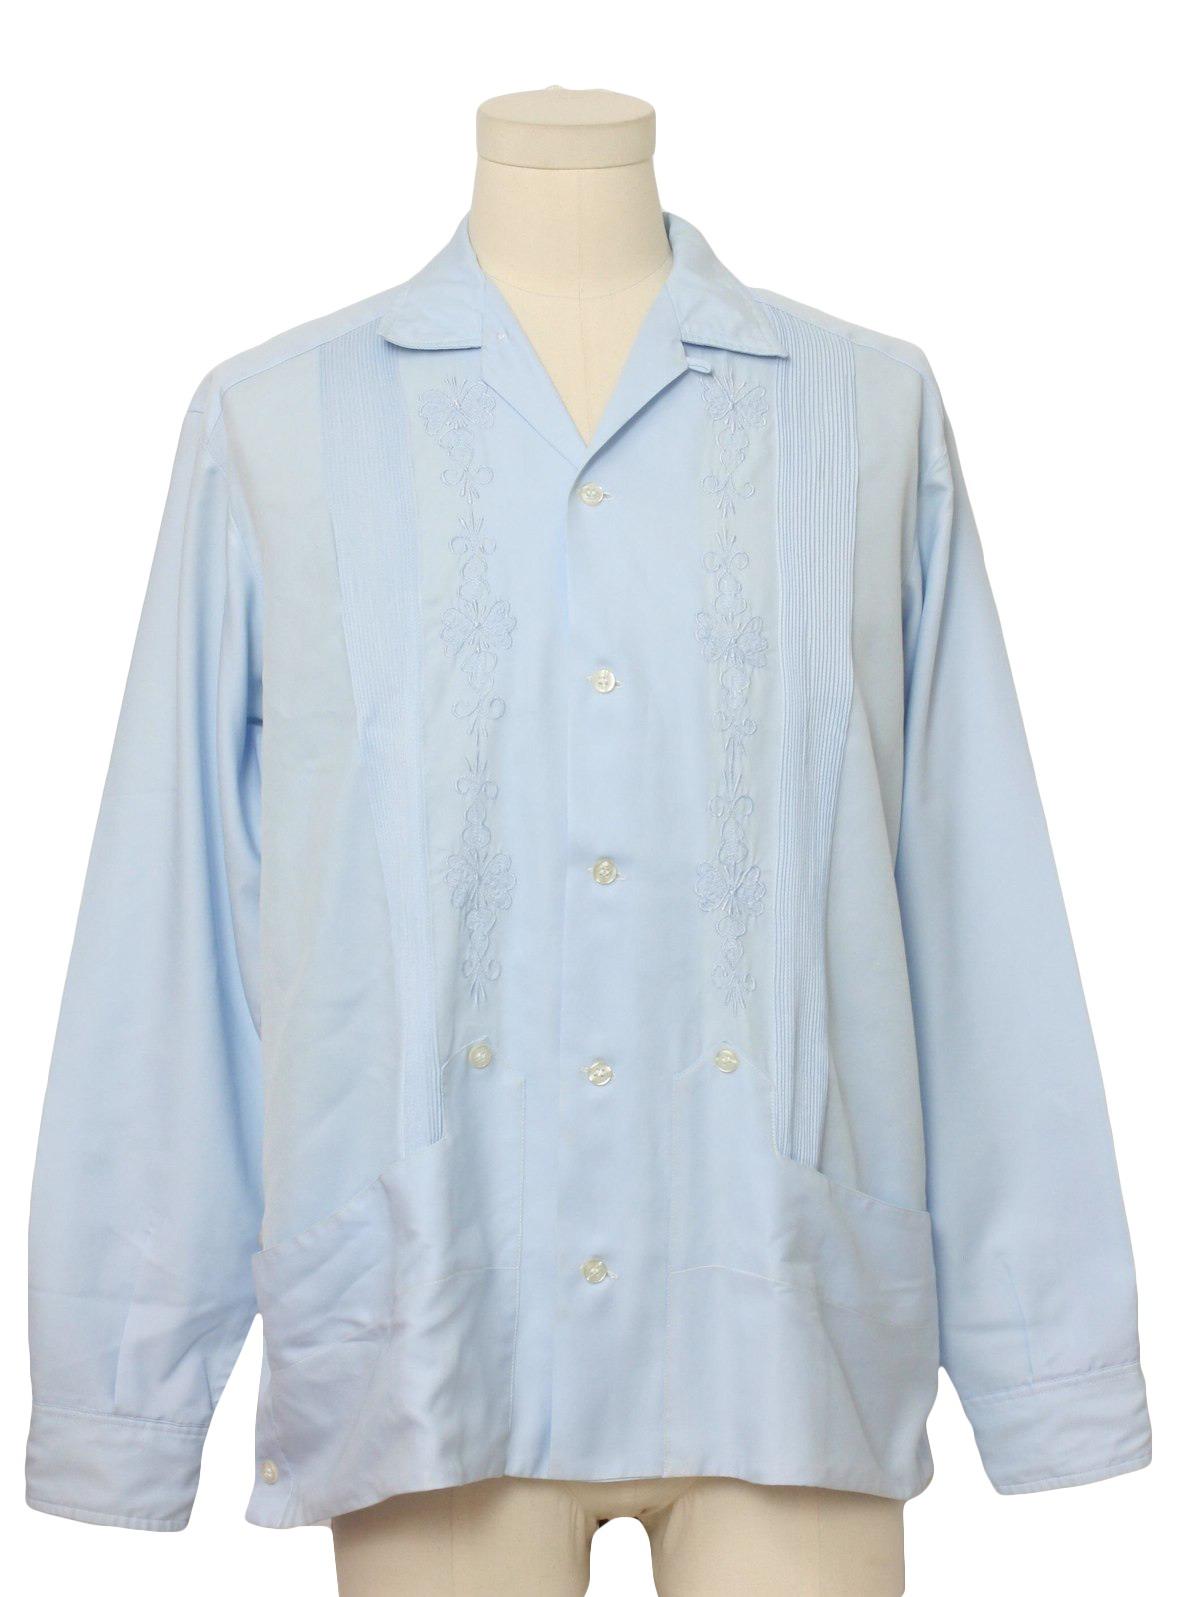 7c1f493f 1960's Vintage Cubana Guayabera Shirt: 60s -Cubana- Mens light blue silky  polyester longsleeve Guayabera or Mexican wedding shirt.